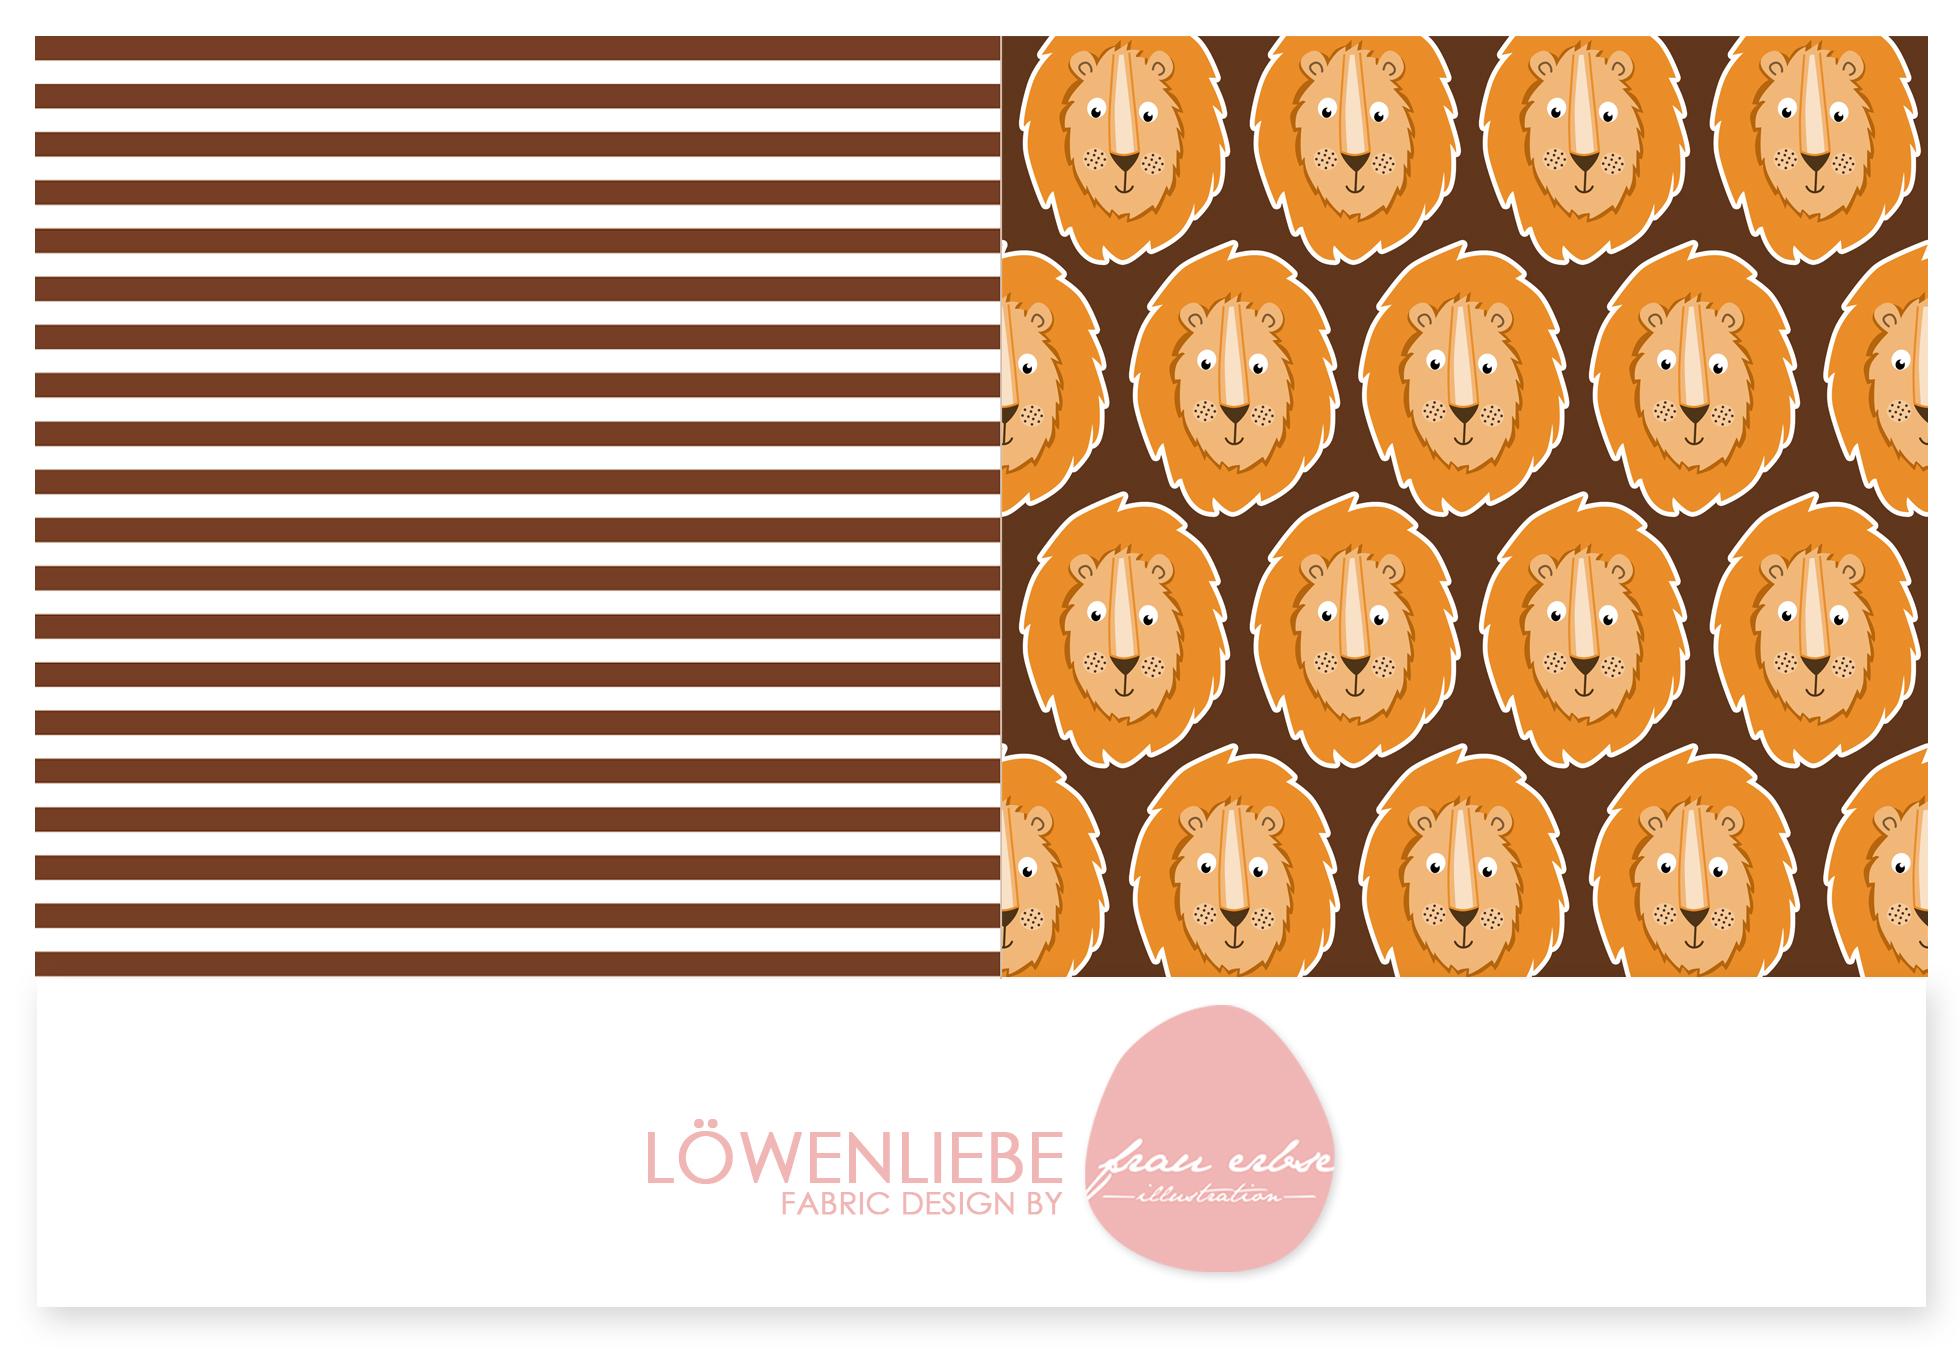 Stoffdesign Loewenliebe